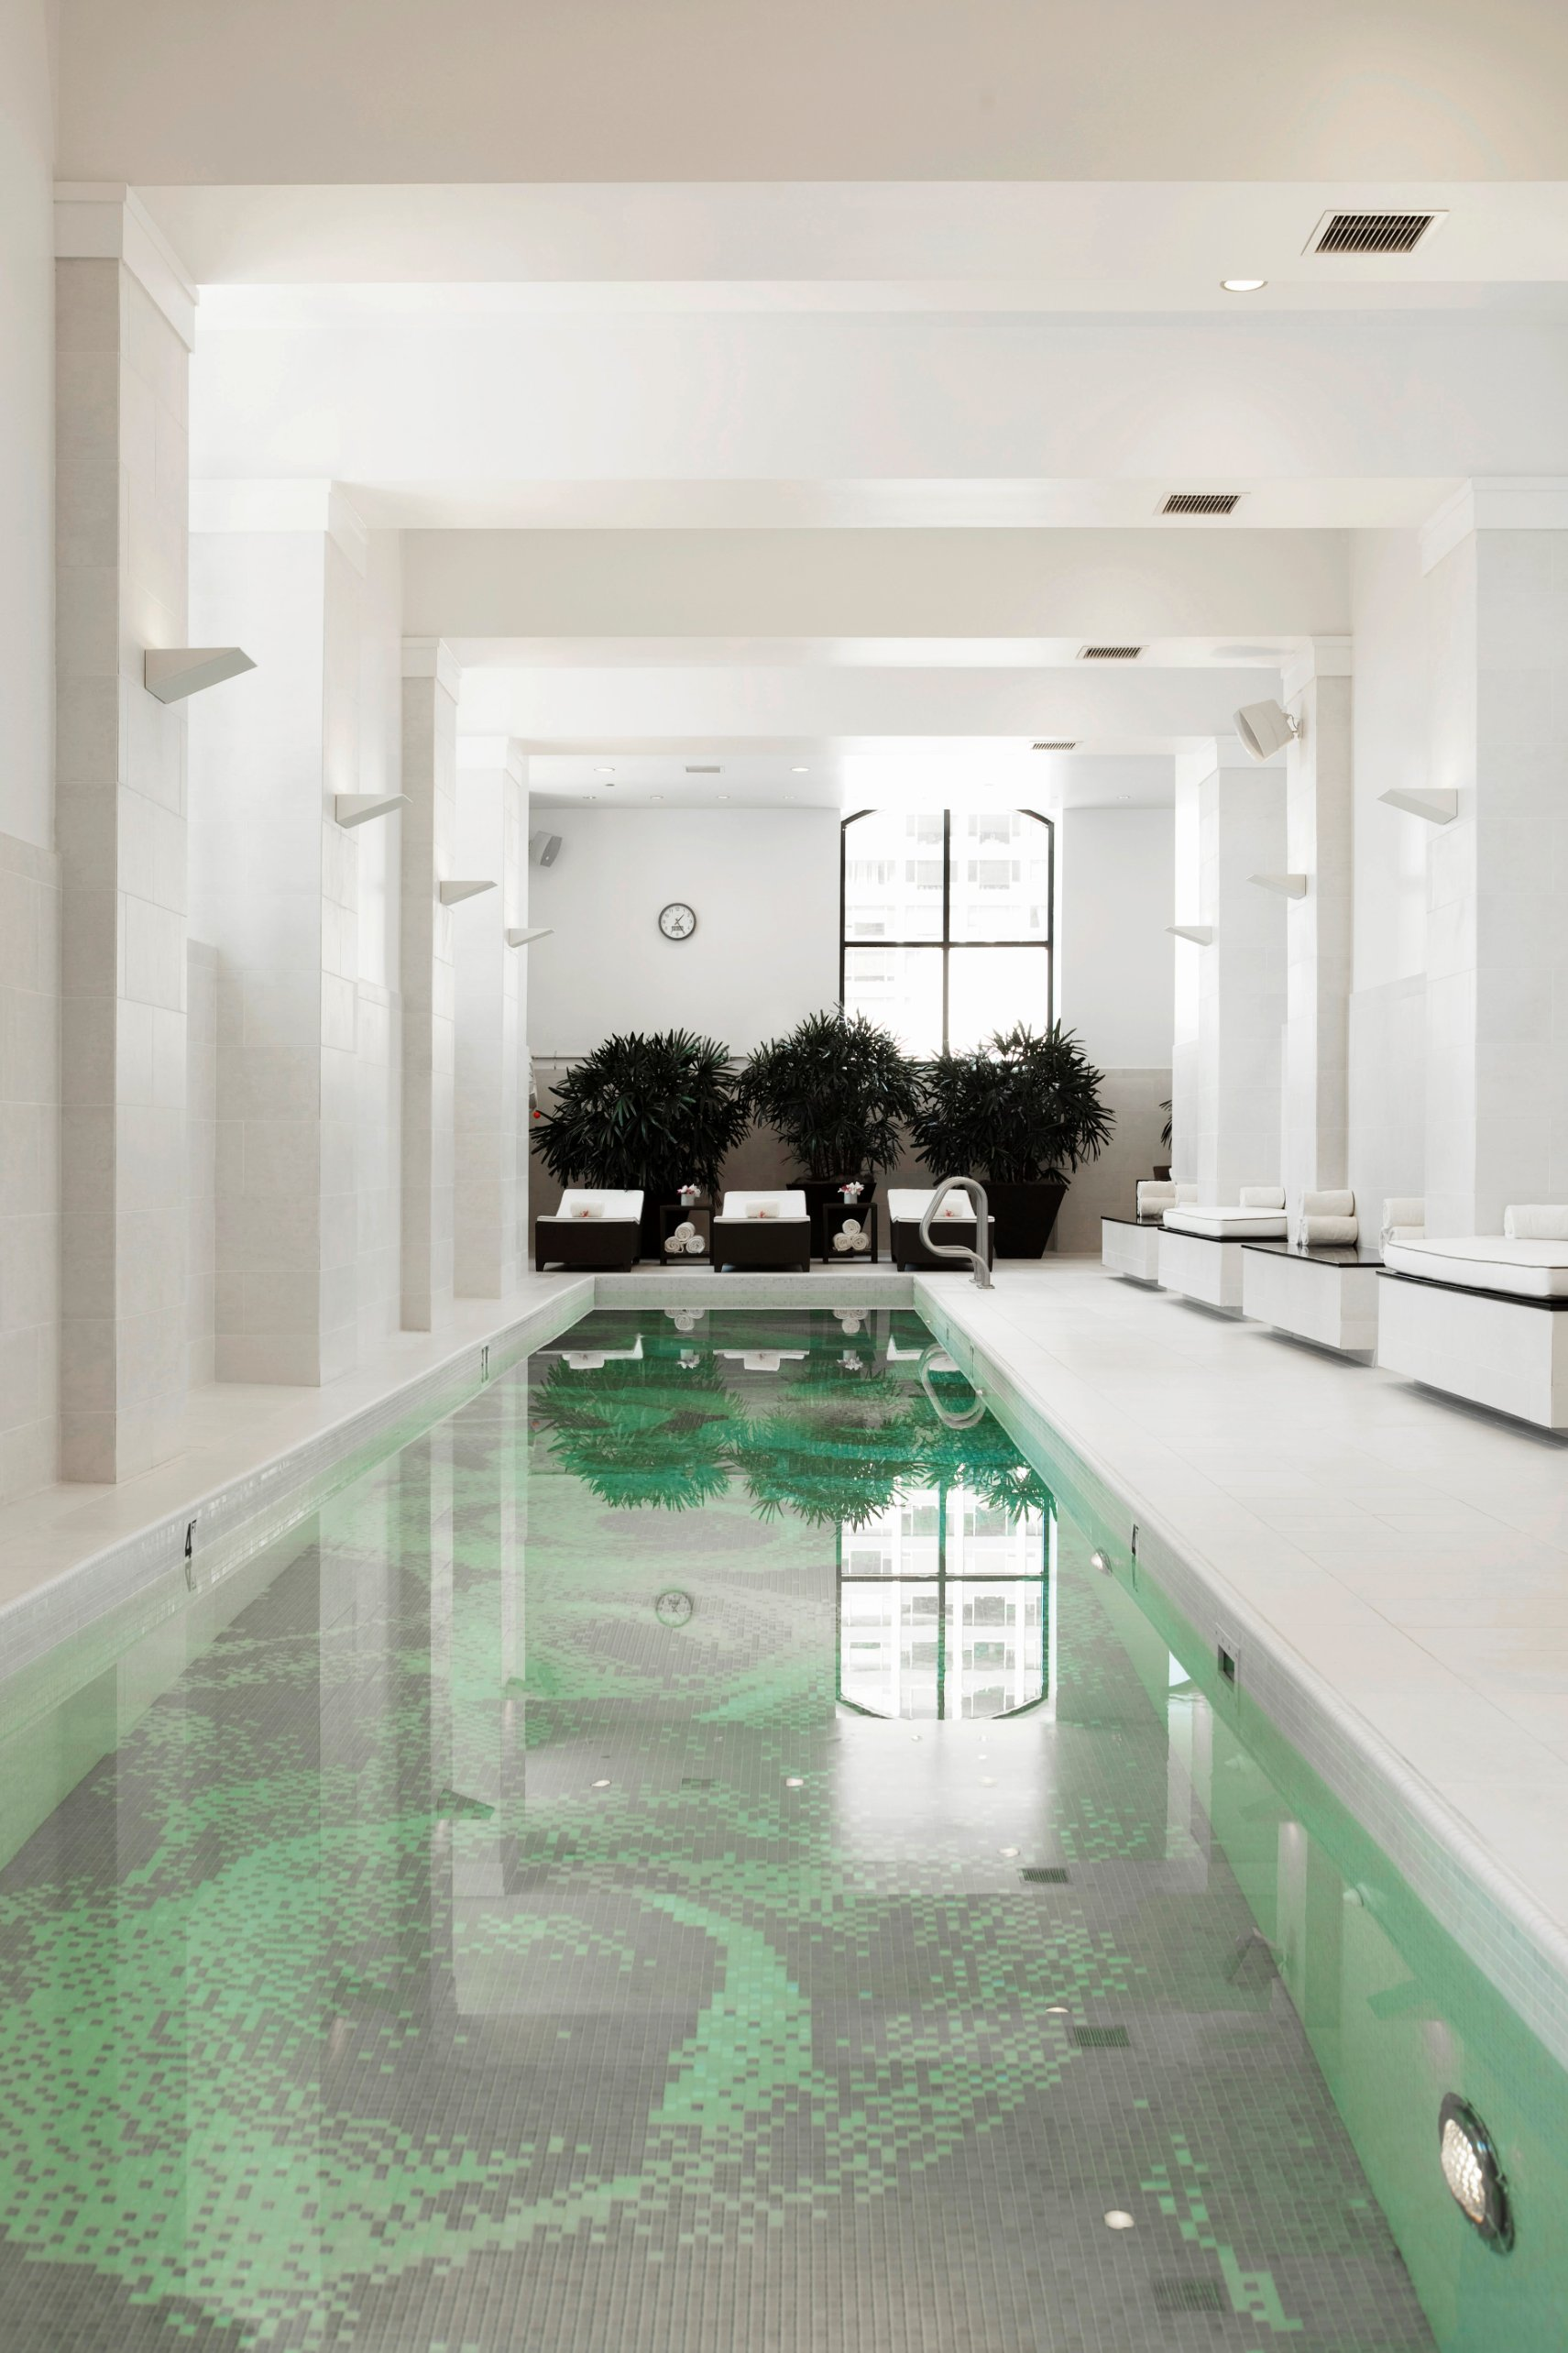 8 of the best indoor hotel pools around the world - CNN | CNN Travel